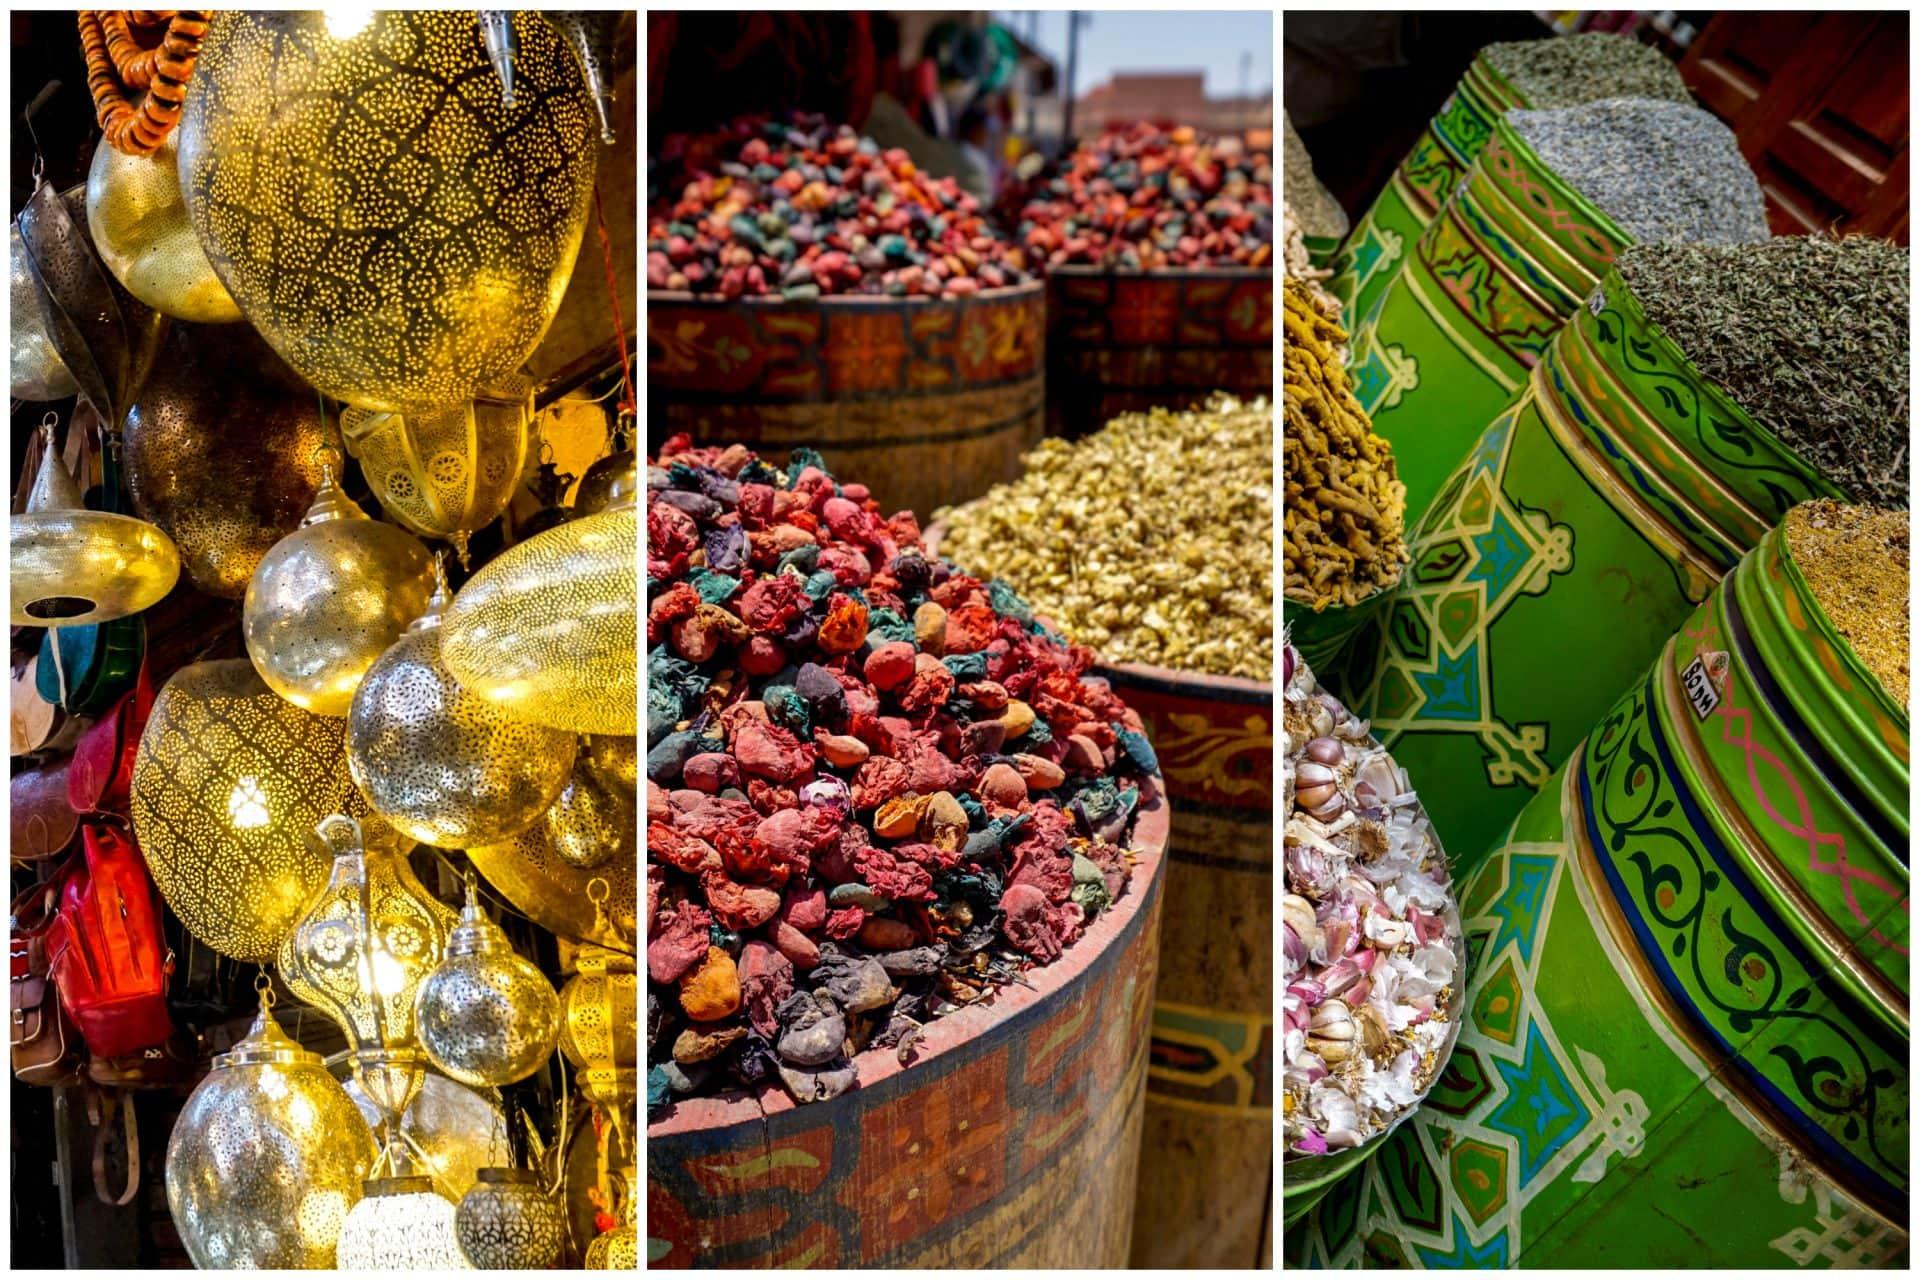 Souk, Marrakesh, Morocco - Experiencing the Globe